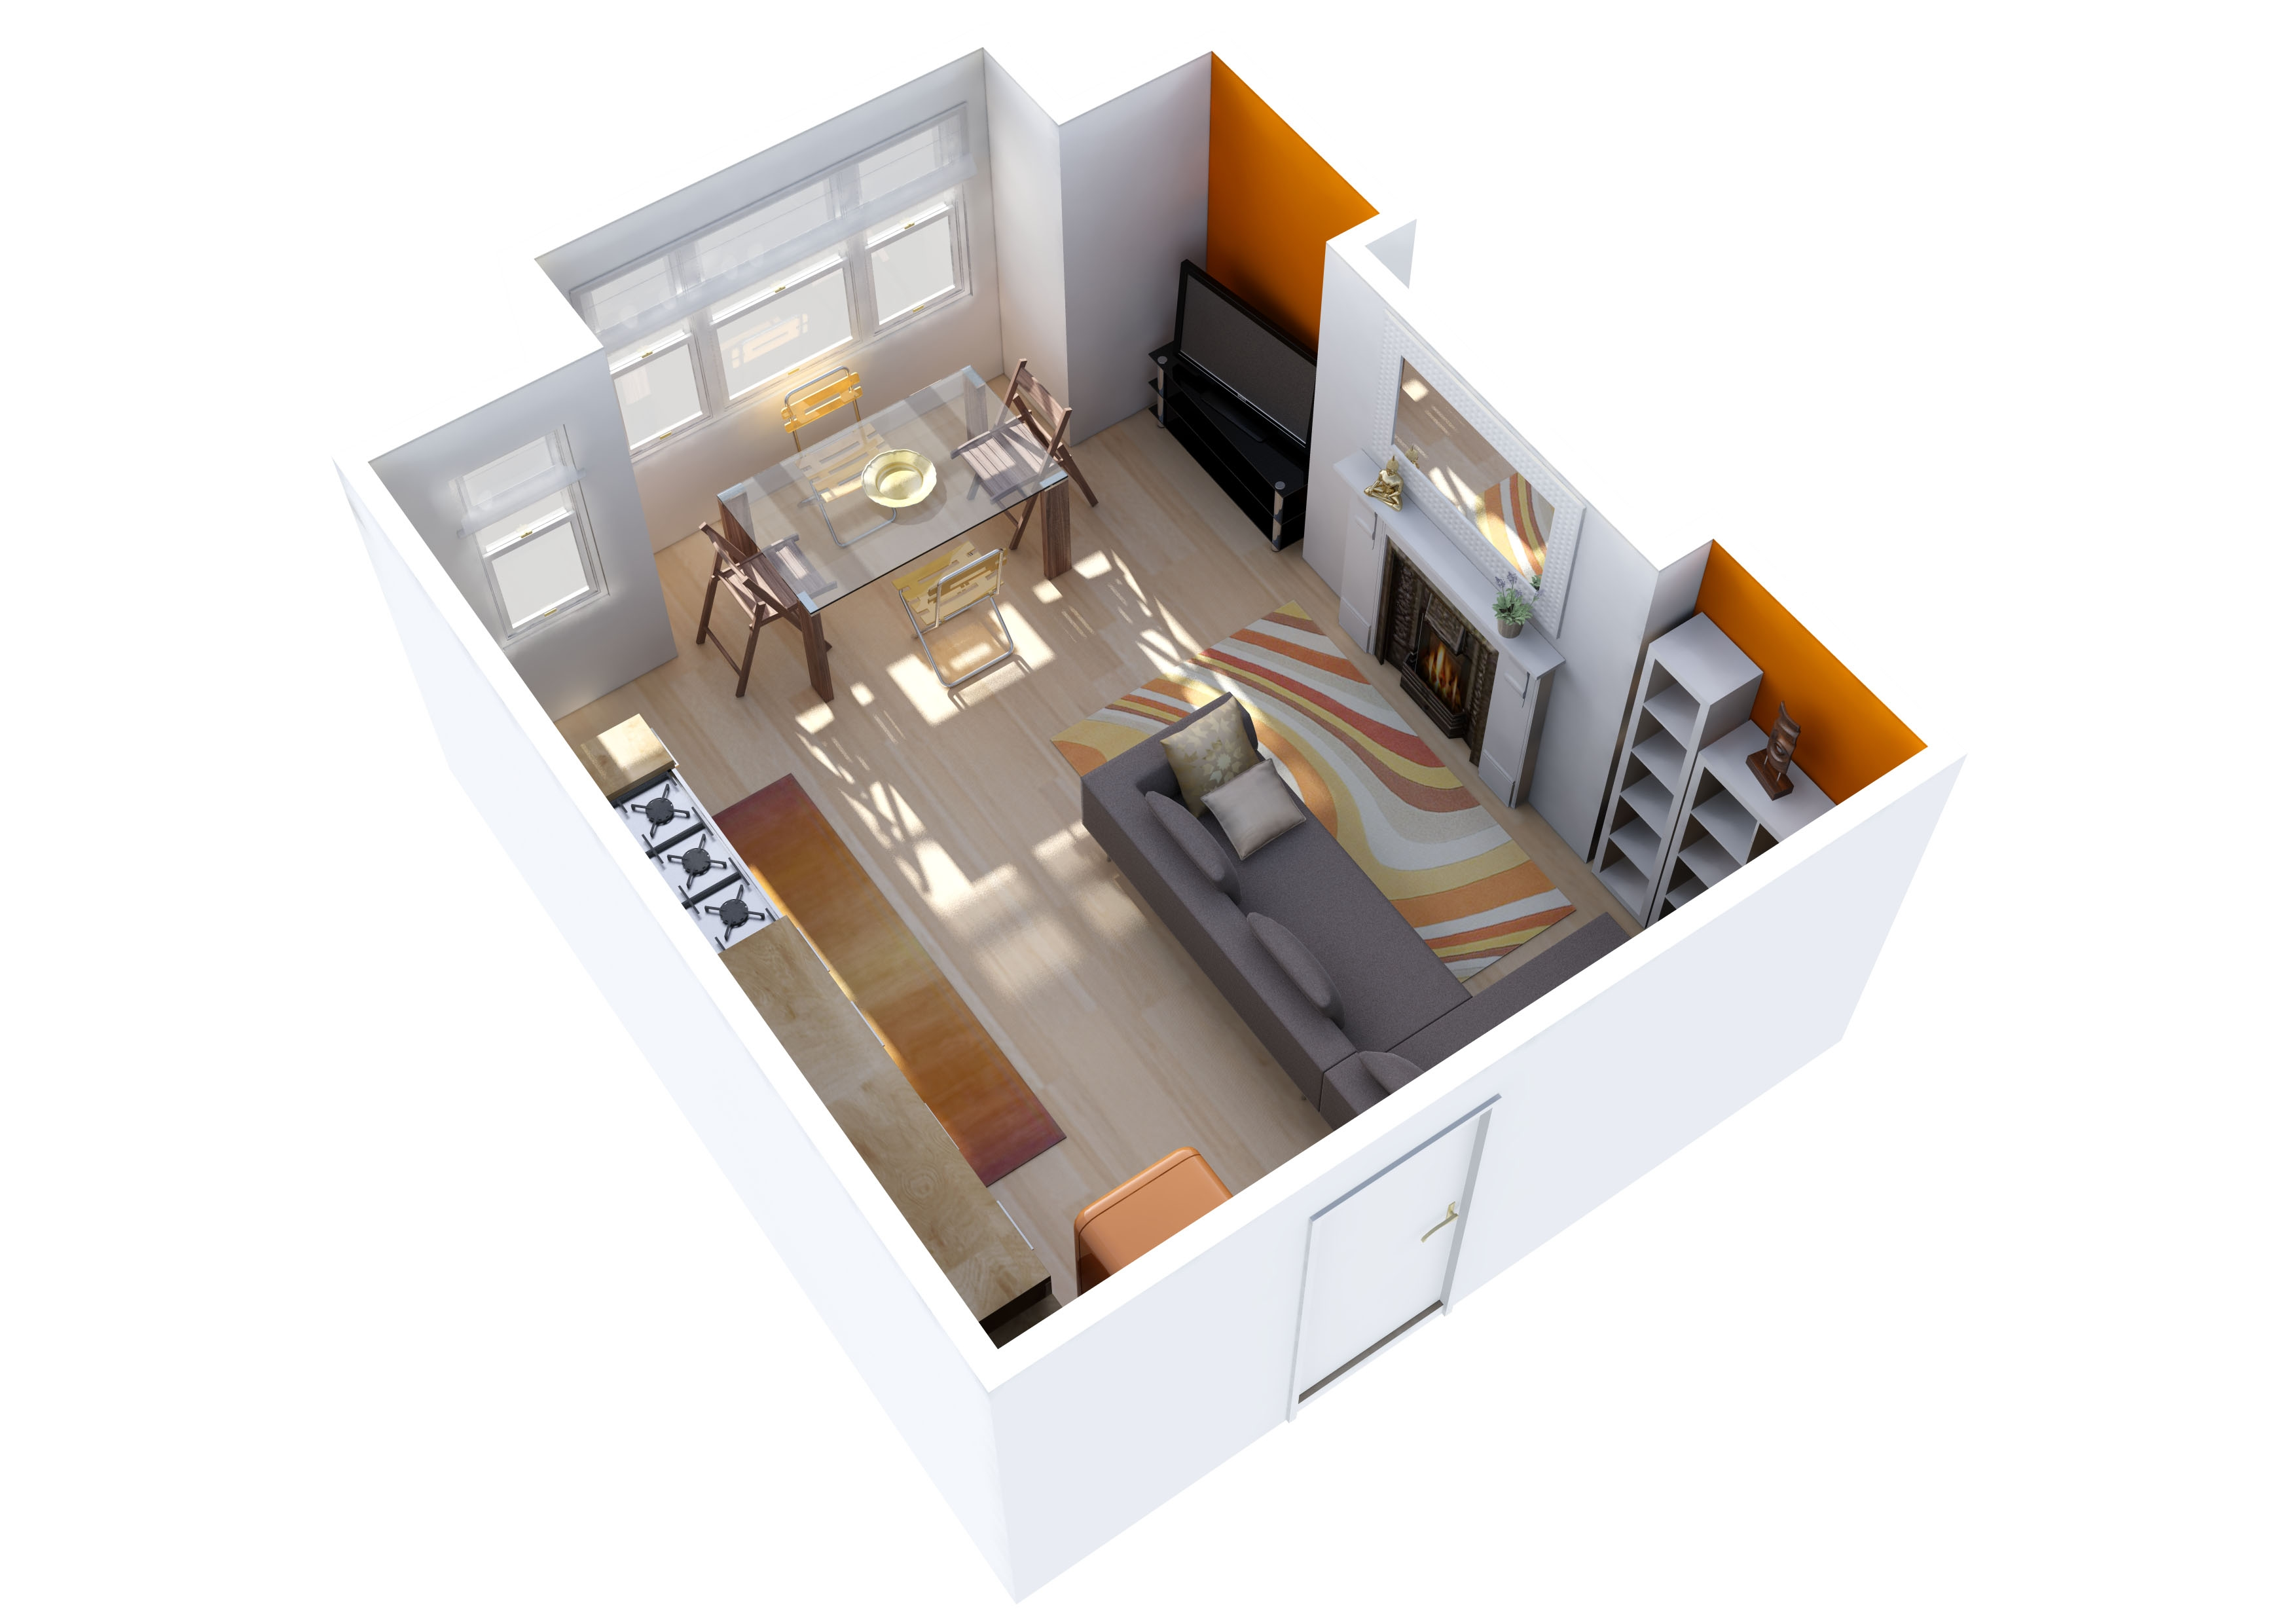 Apartment Room Planner my deco 3d room planner - interior design